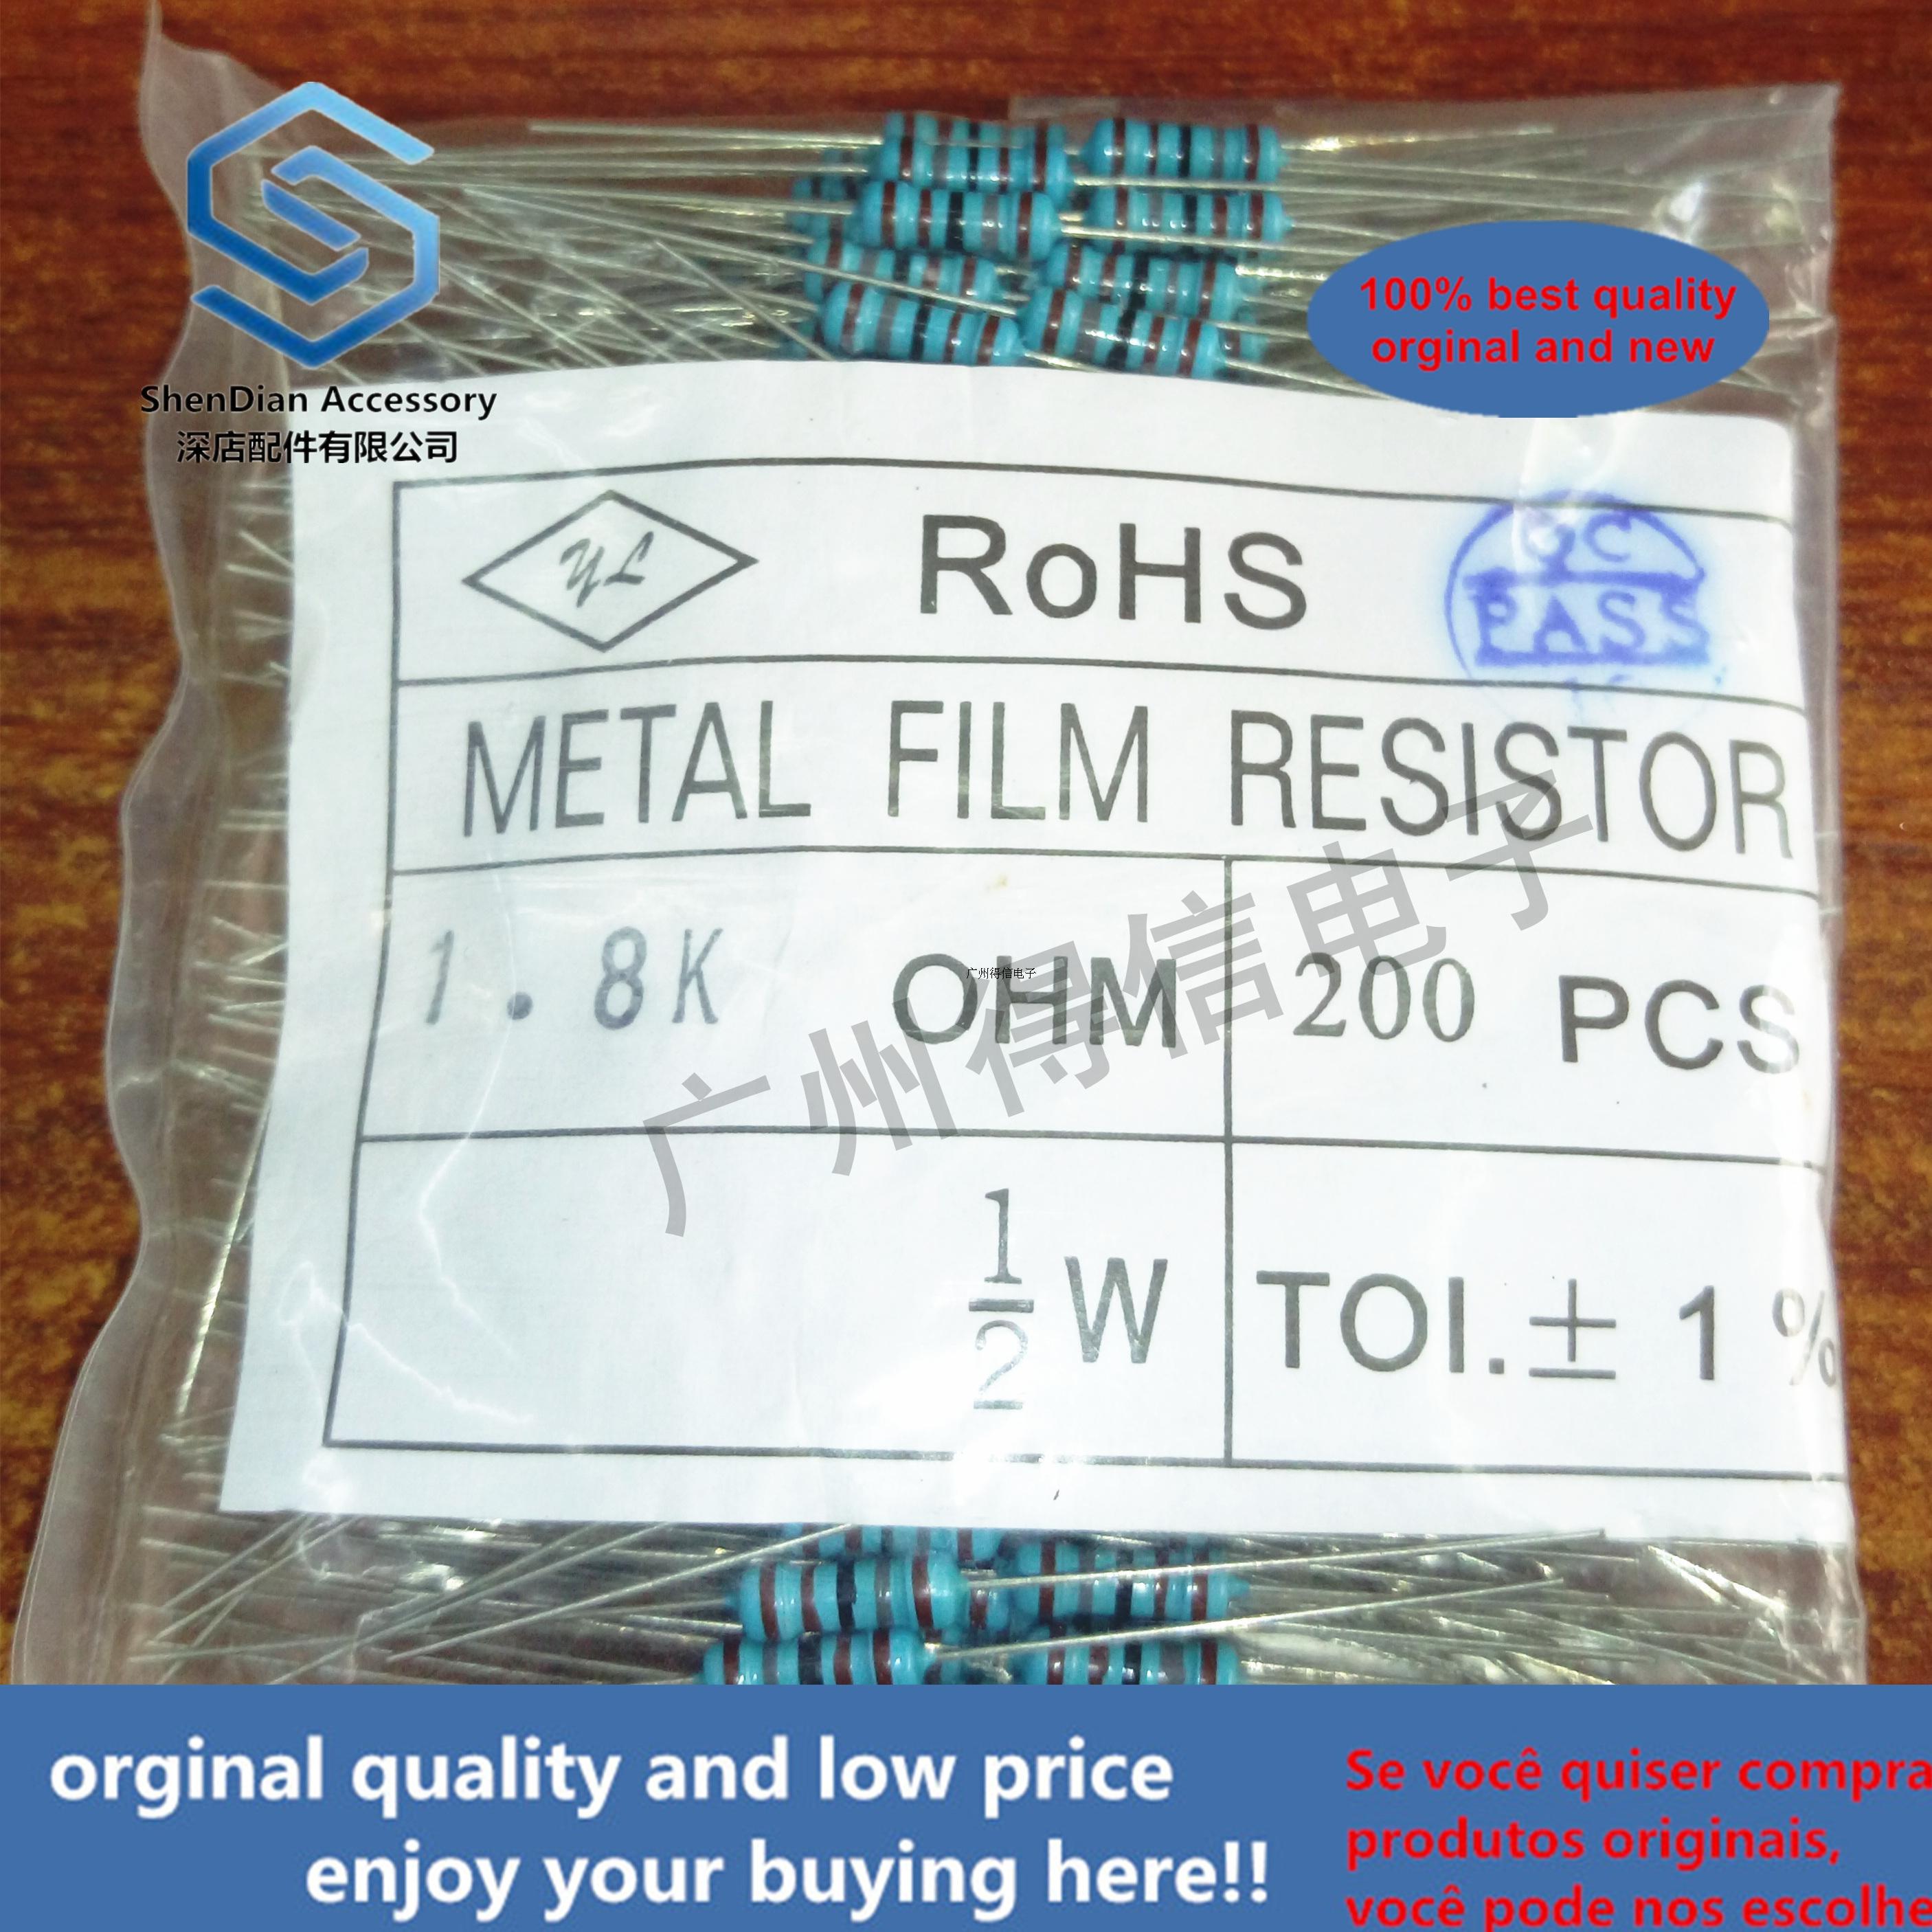 200pcs 1 / 2W 20R 20 Euro 1% Brand New Metal Film Iron Feet Resistor Bag 200 Pcs Per Pack